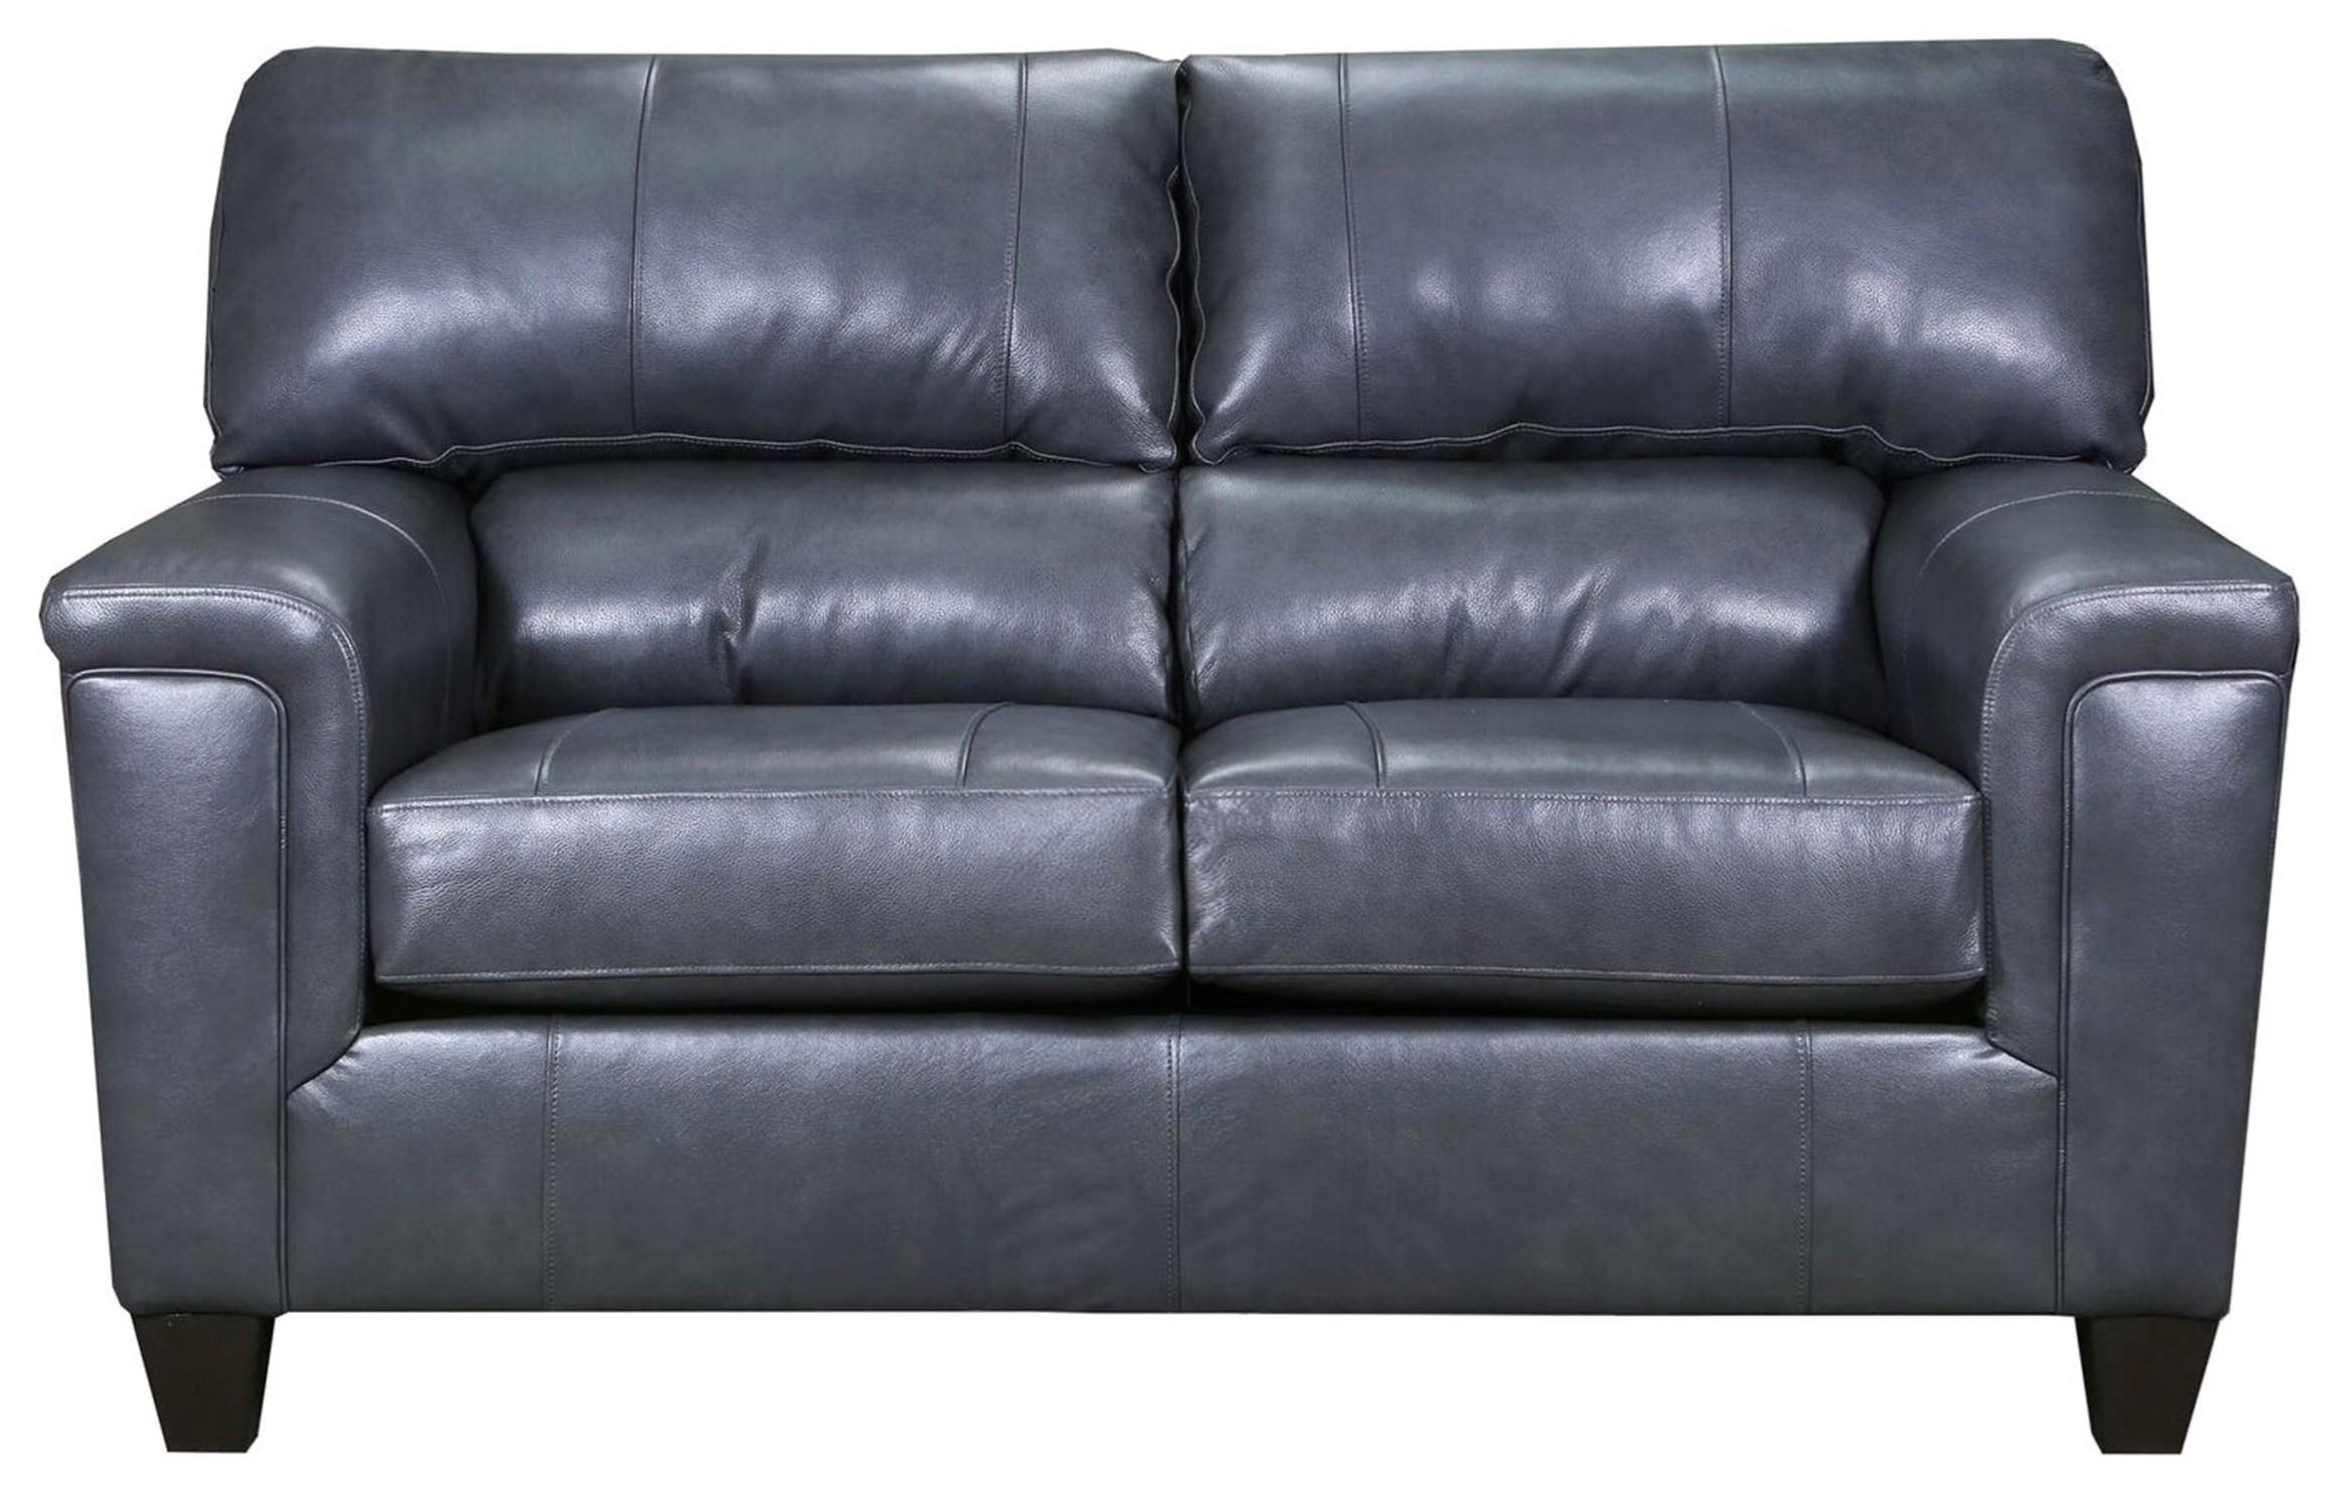 Picture of: Lane Home Furnishings Birch Creek Gray Fog Leather Loveseat Royal Furniture Loveseats